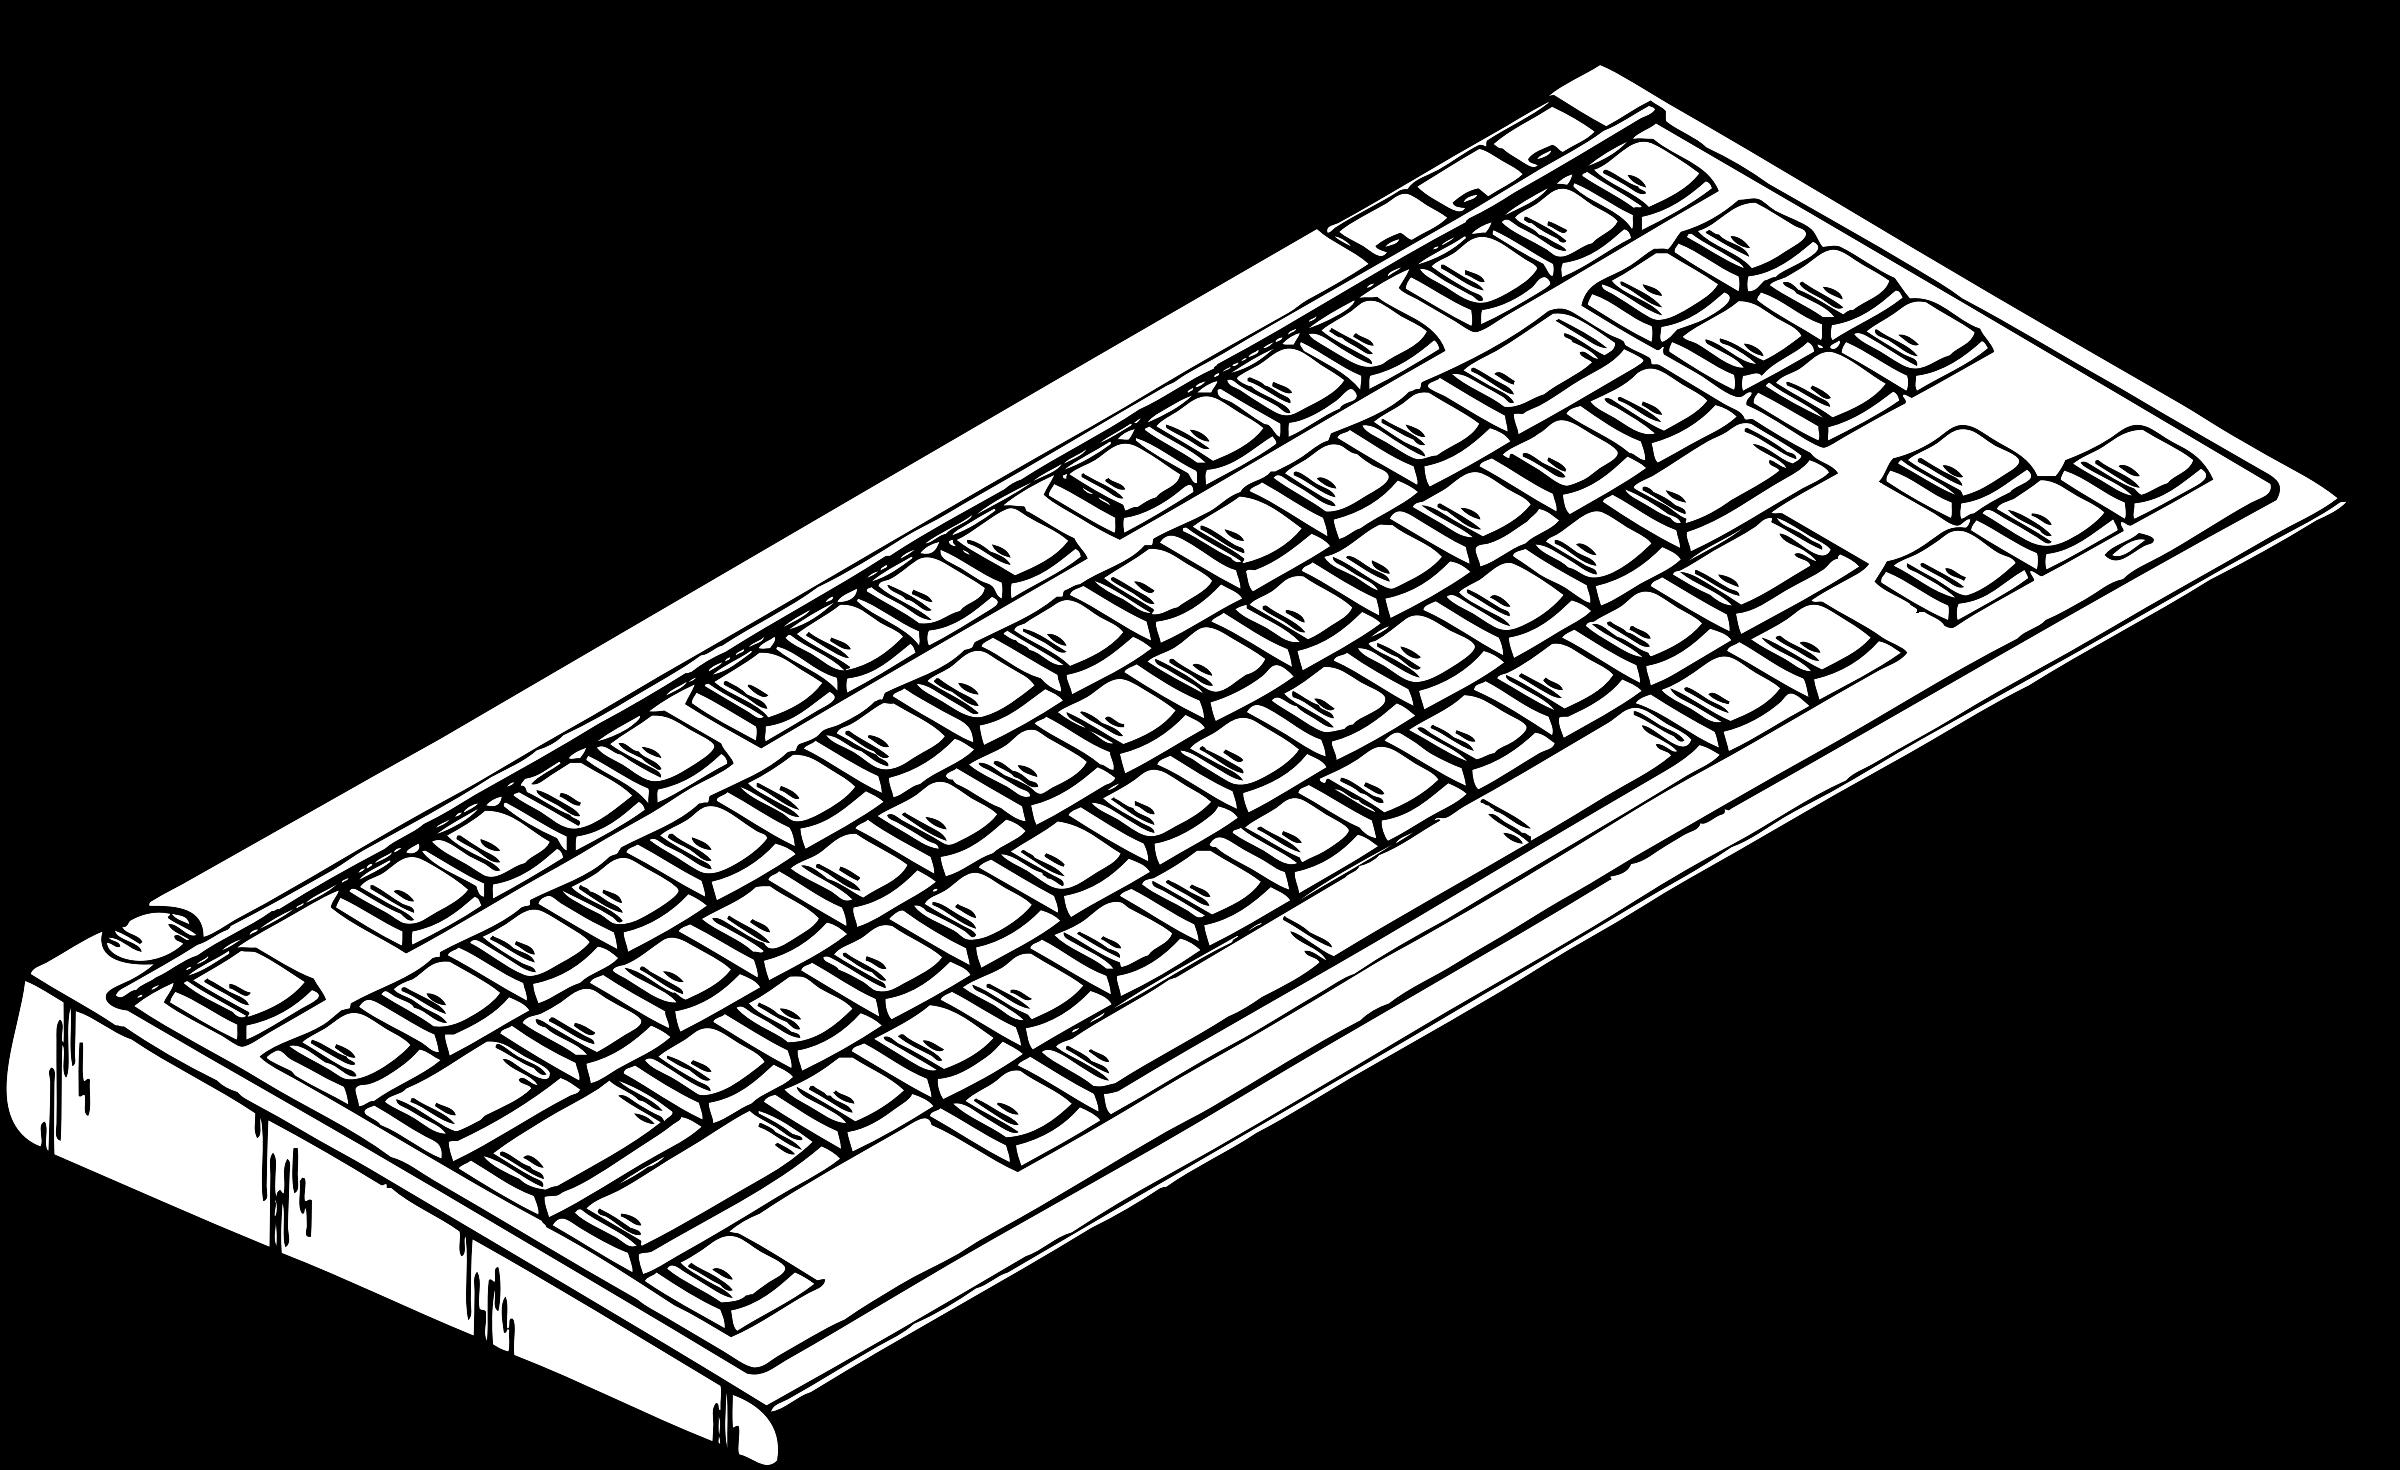 Big image png. Computer clipart keyboard